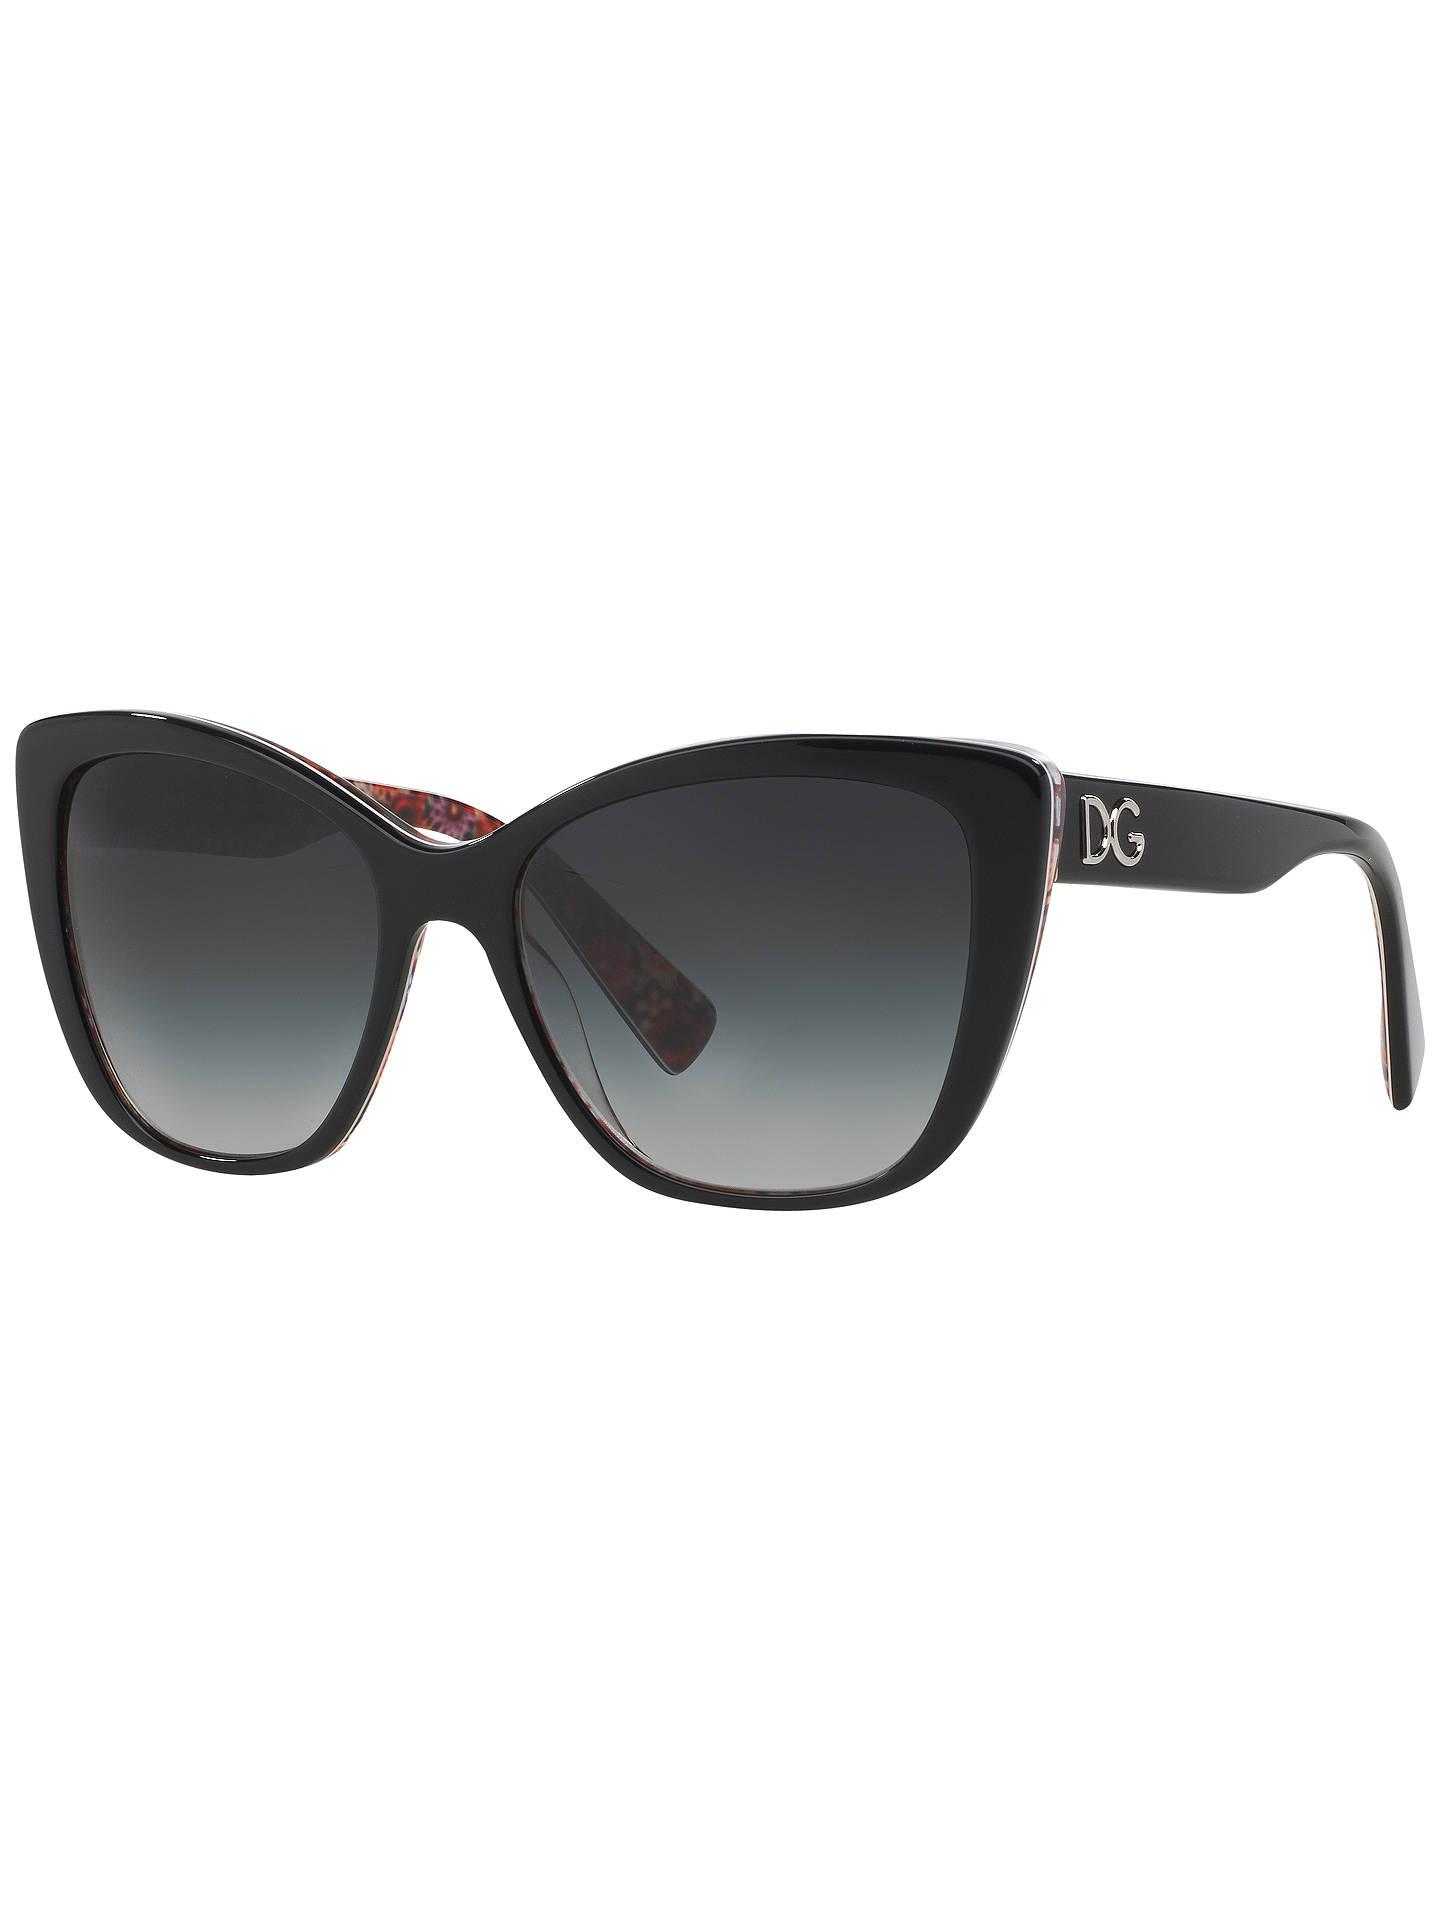 f869bdaf014f Dolce   Gabbana DG4216 Cat s Eye Floral Arm Sunglasses at John Lewis ...